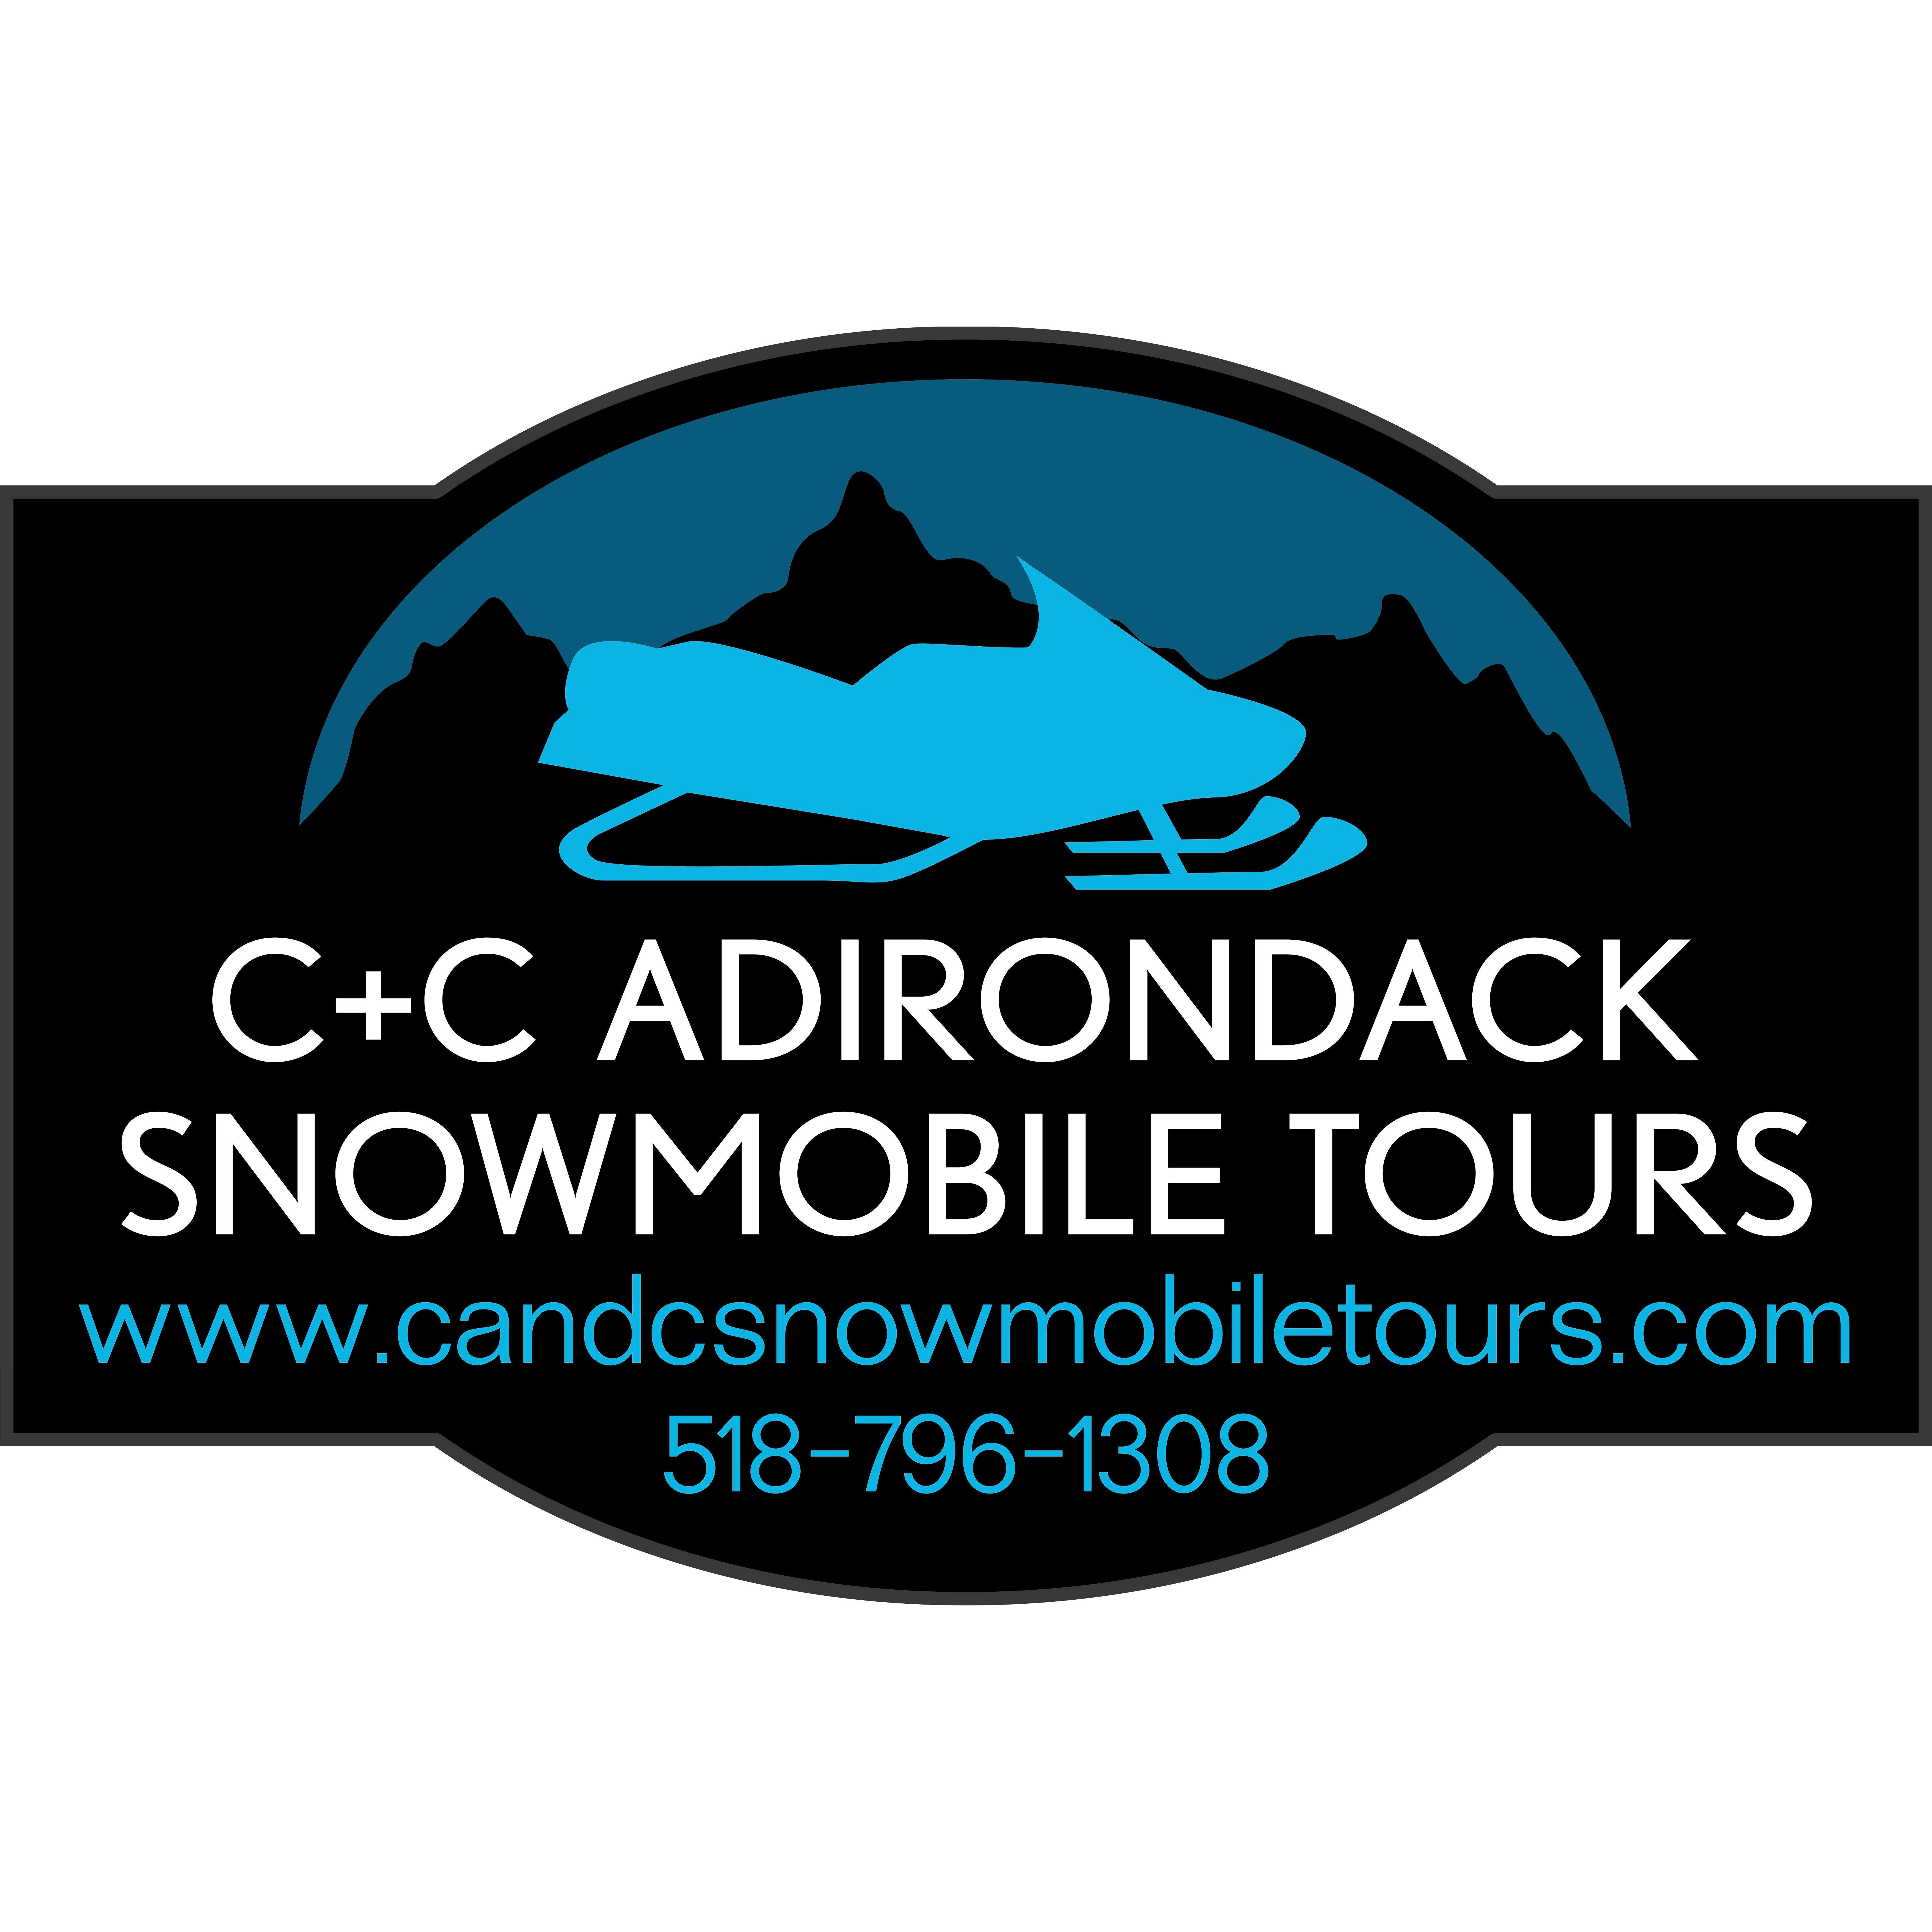 C&C Adirondack Snowmobile Tours